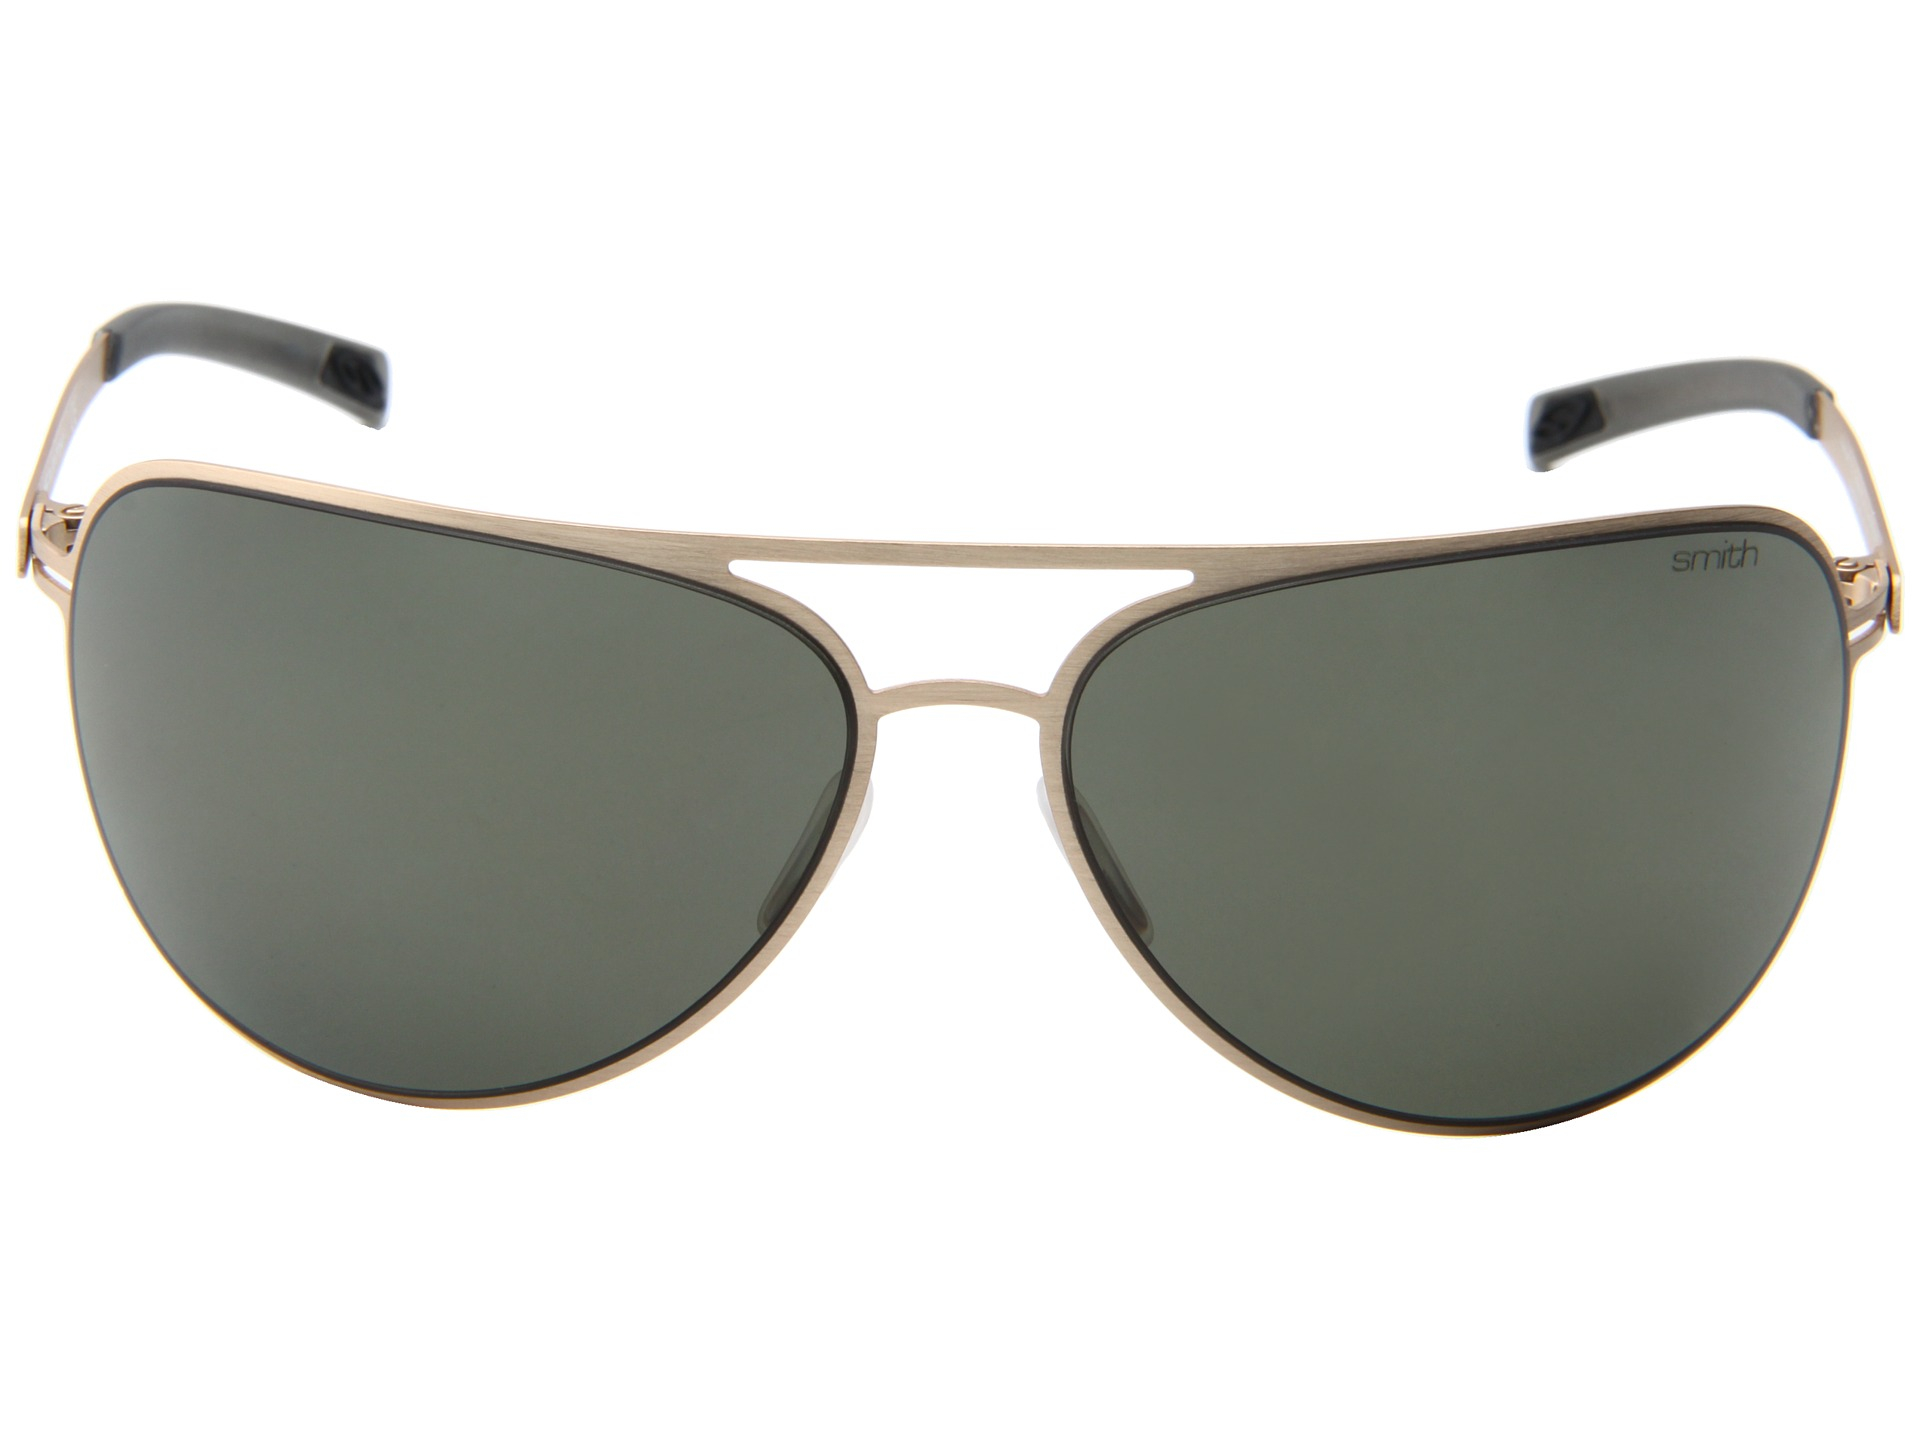 4237d6df02 Lyst - Smith Optics Showdown Sunglasses in Metallic